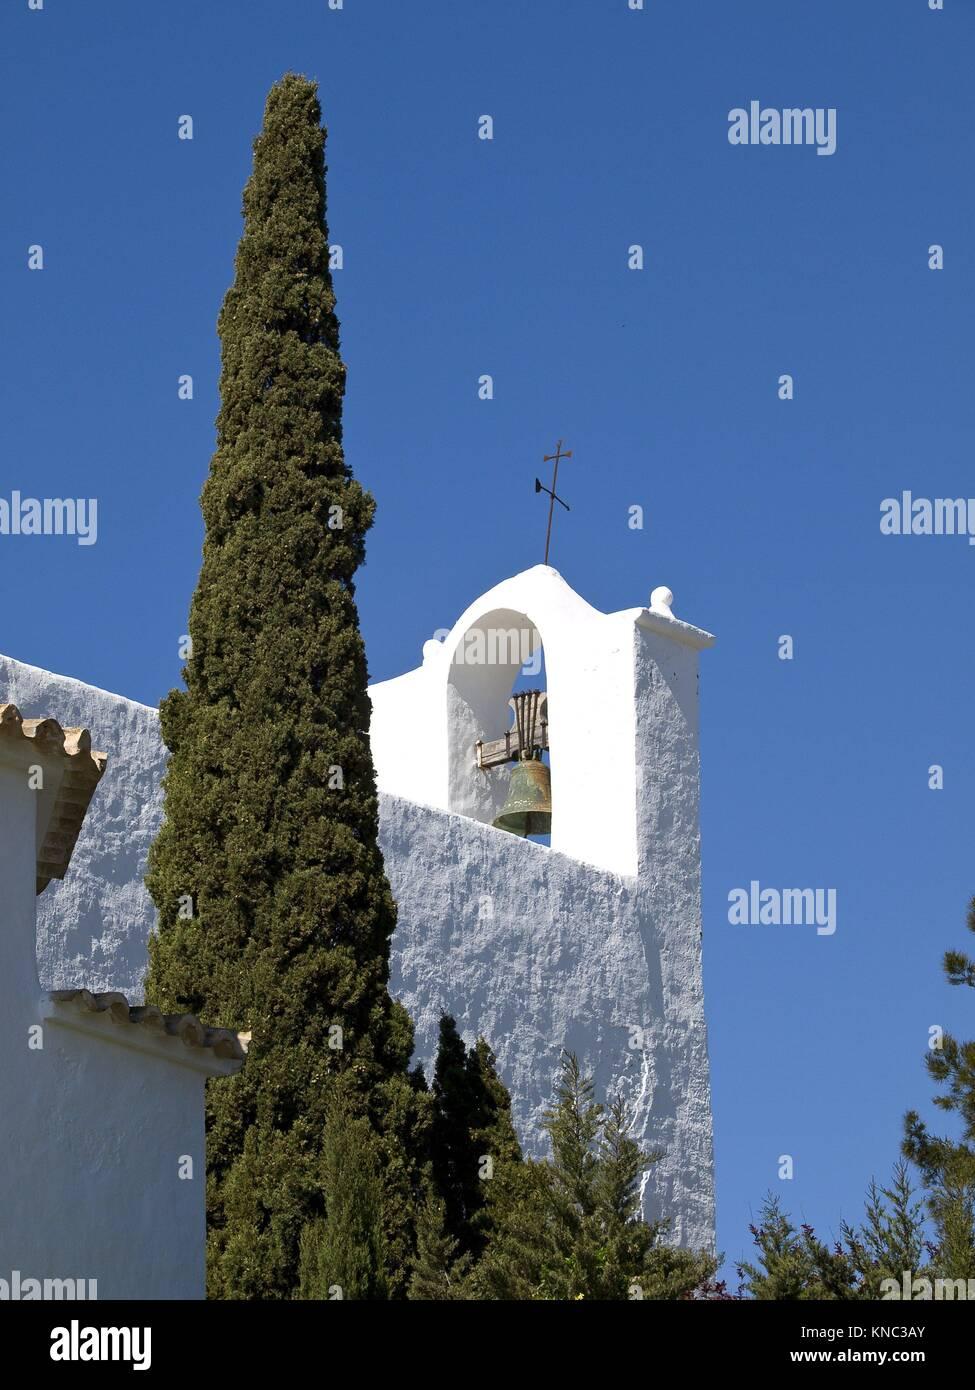 Puig de Missa,Iglesia fortificada(s. XVI). Santa Eularia del Riu. Ibiza. Islas Pitiusas. Baleares. España. - Stock Image